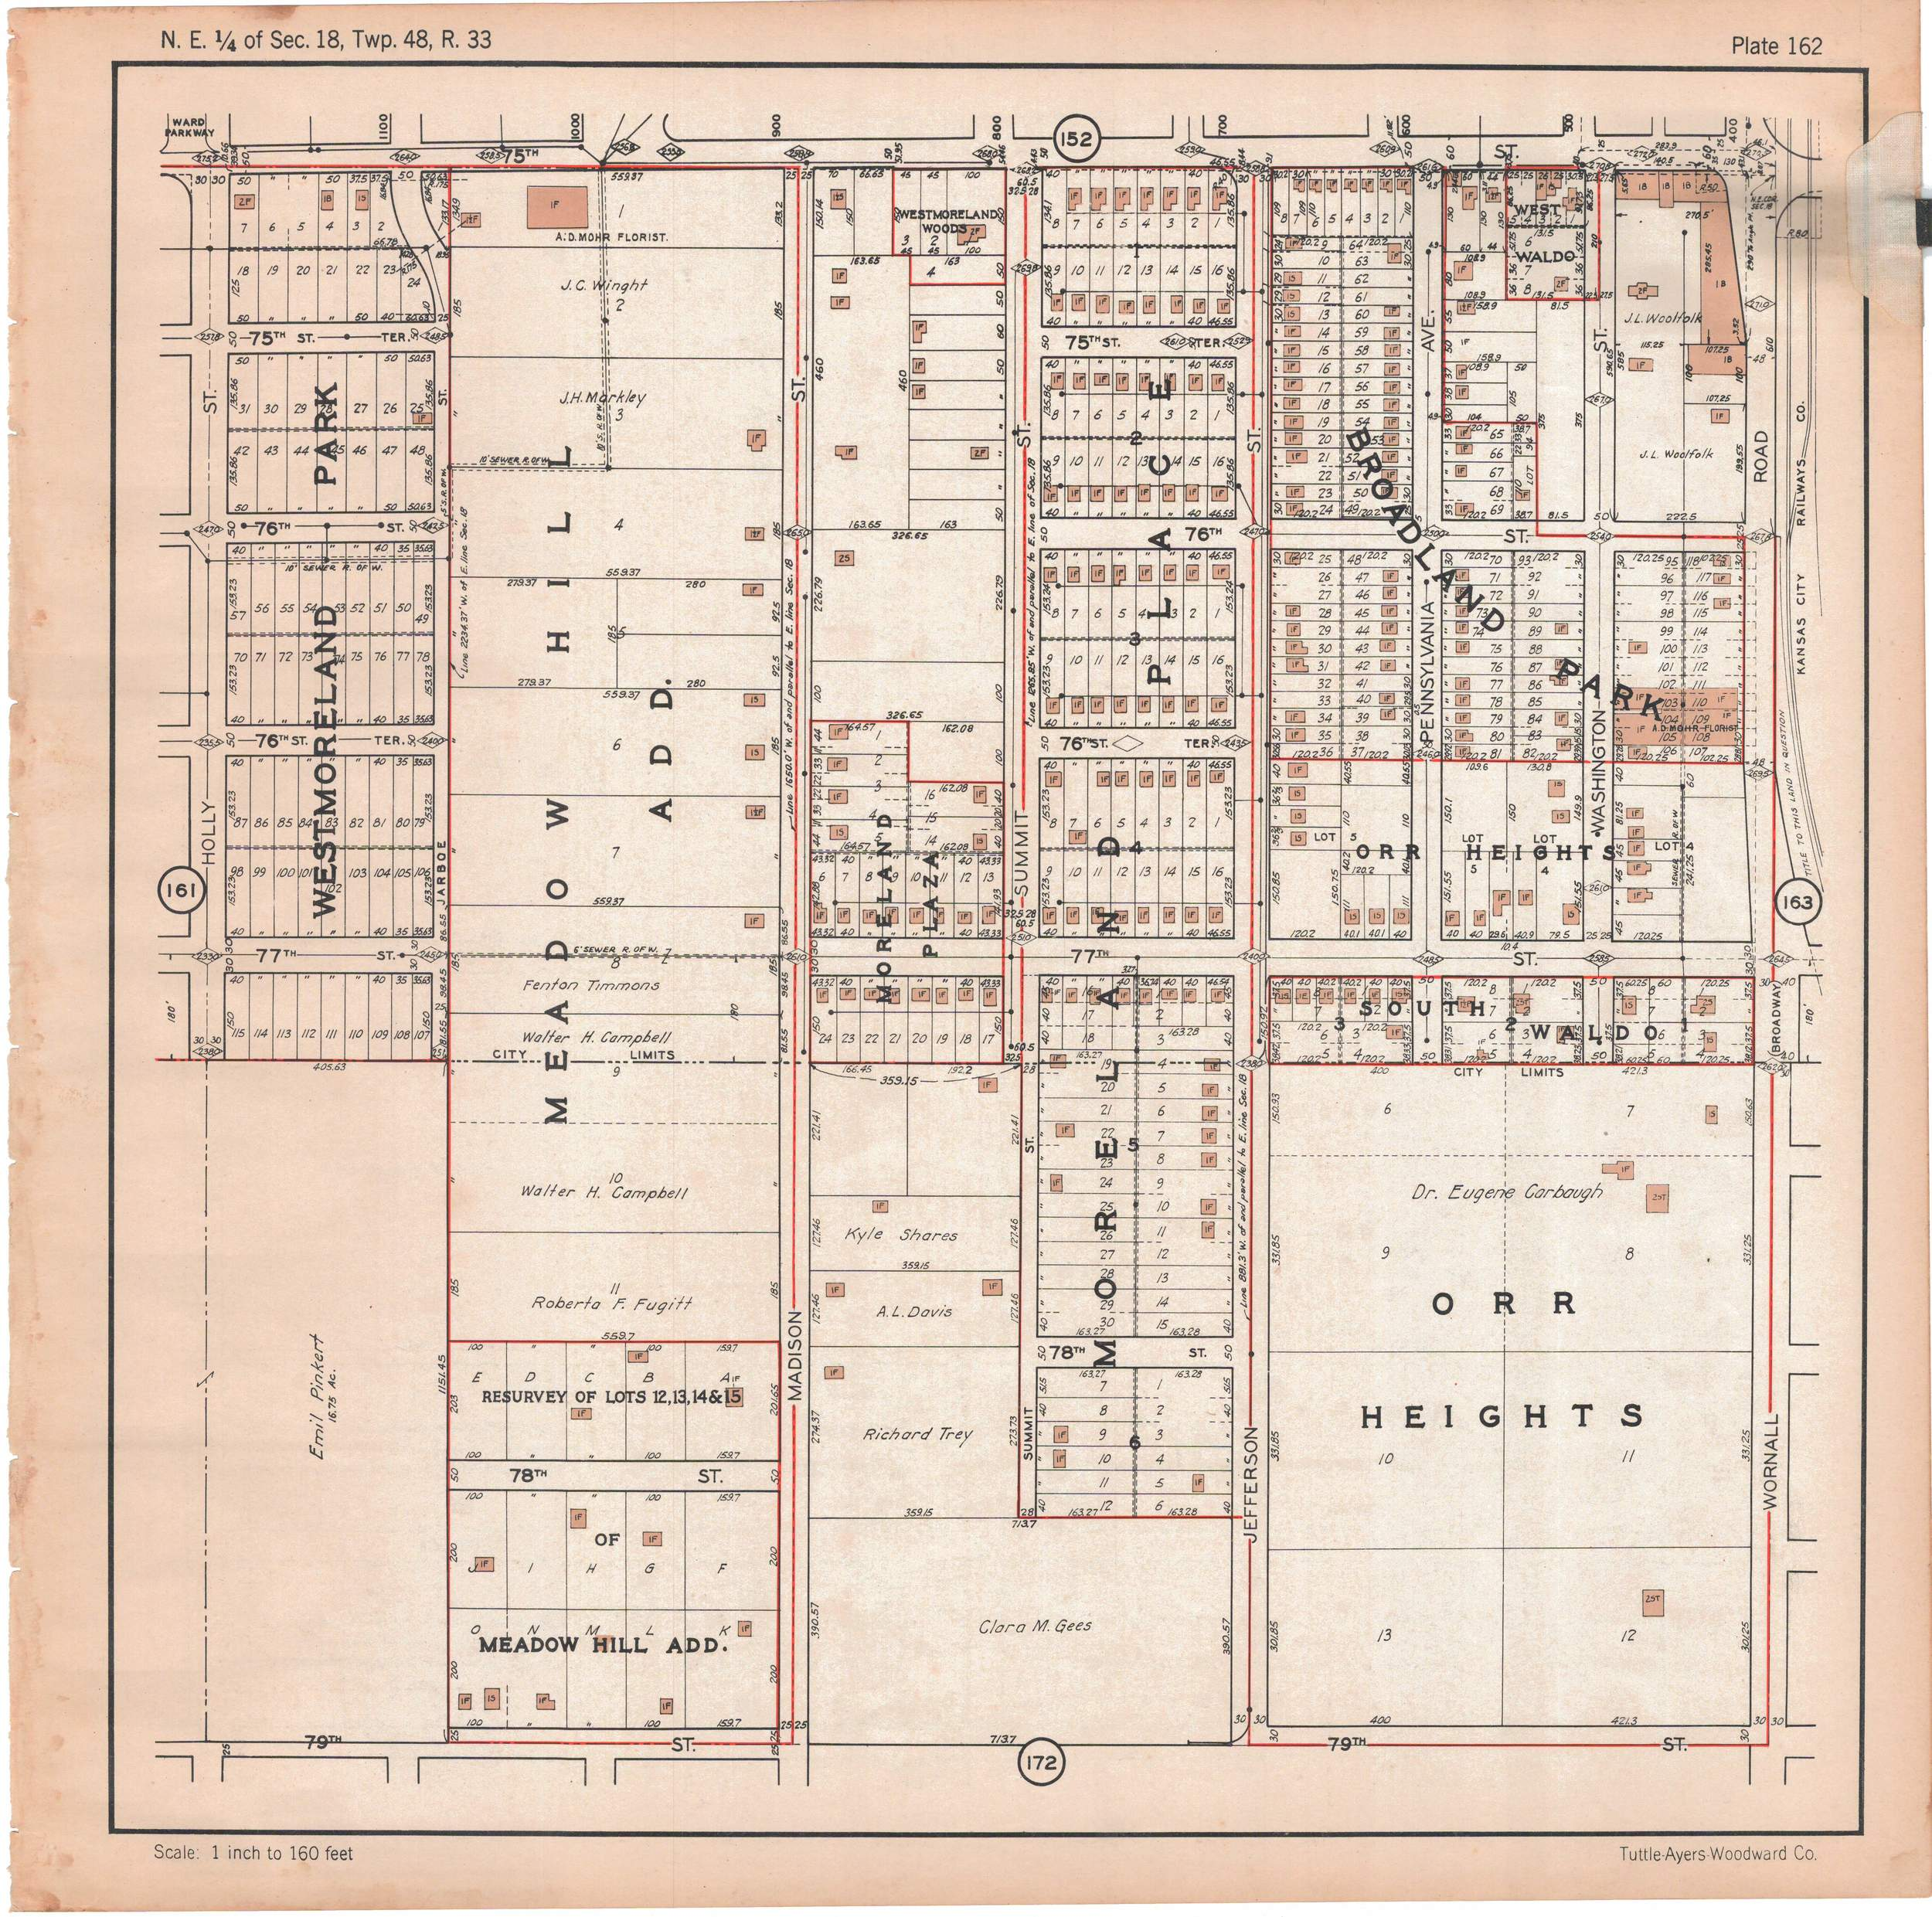 1925 TUTTLE_AYERS_Plate_162.JPG